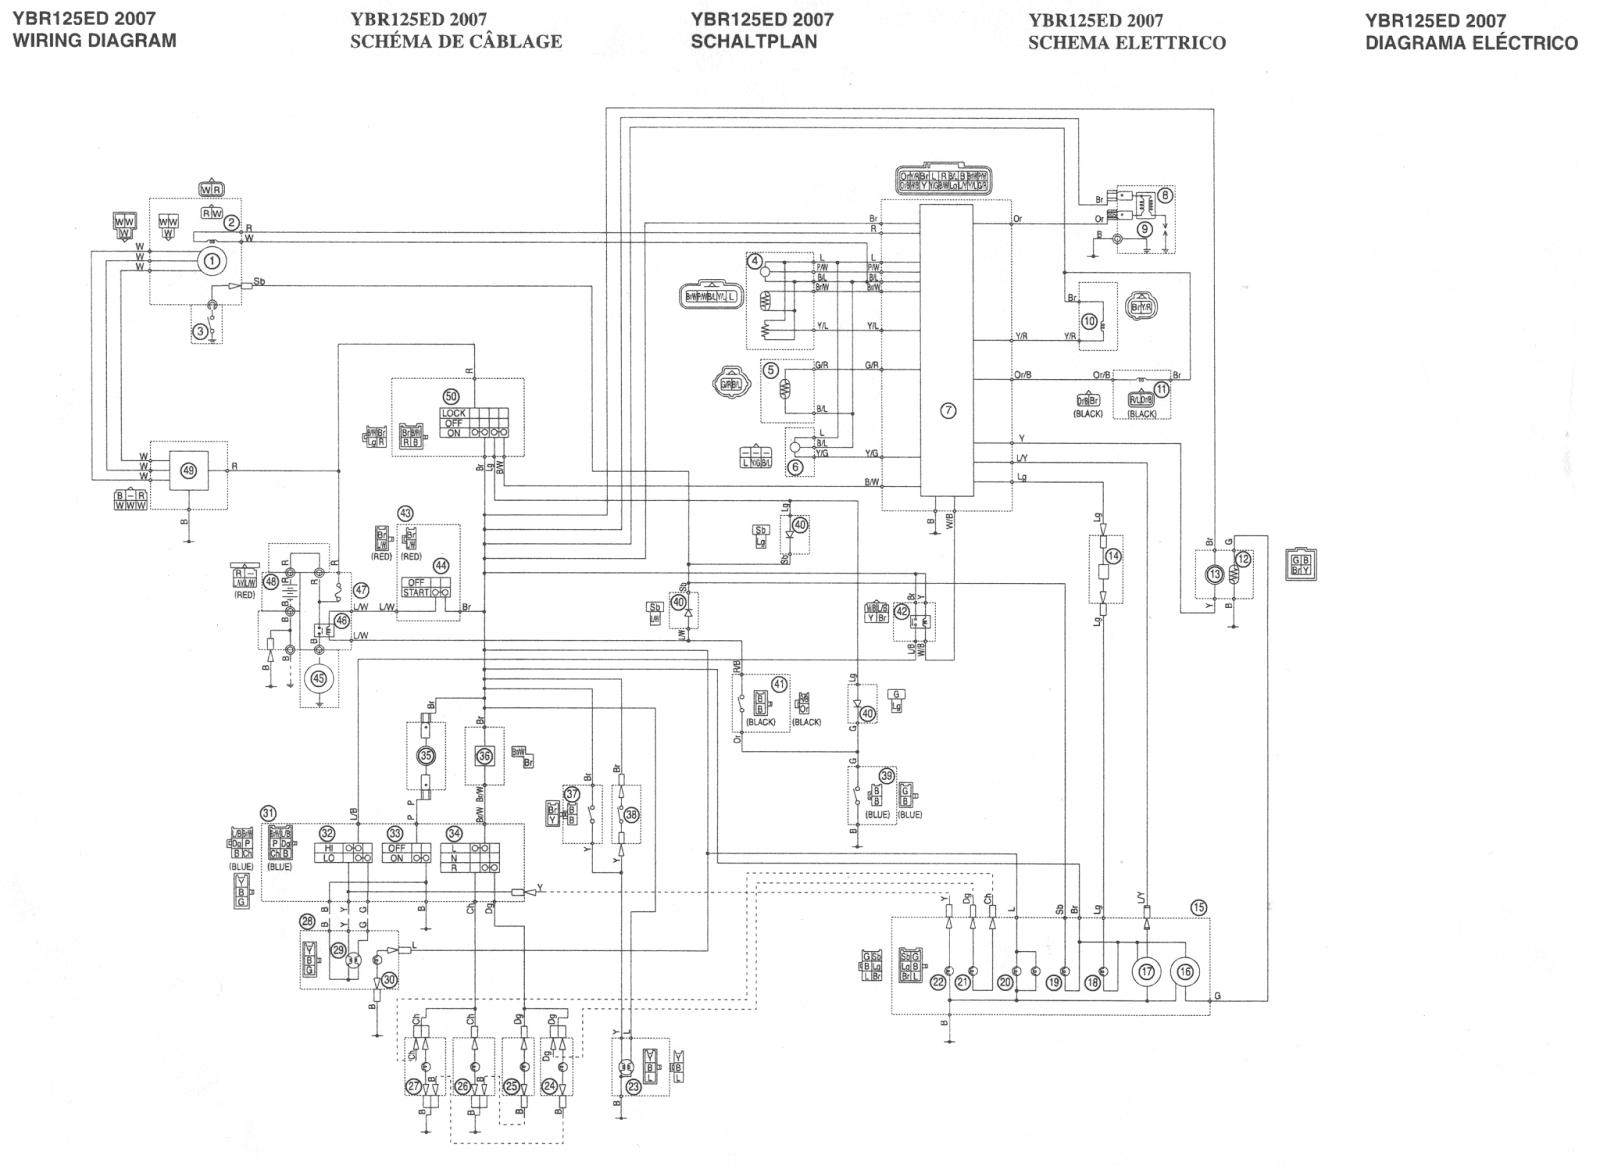 medium resolution of  schema yamaha ybr 125 owner blog yamaha ybr 125 electrical system yamaha virago 250 wiring diagram